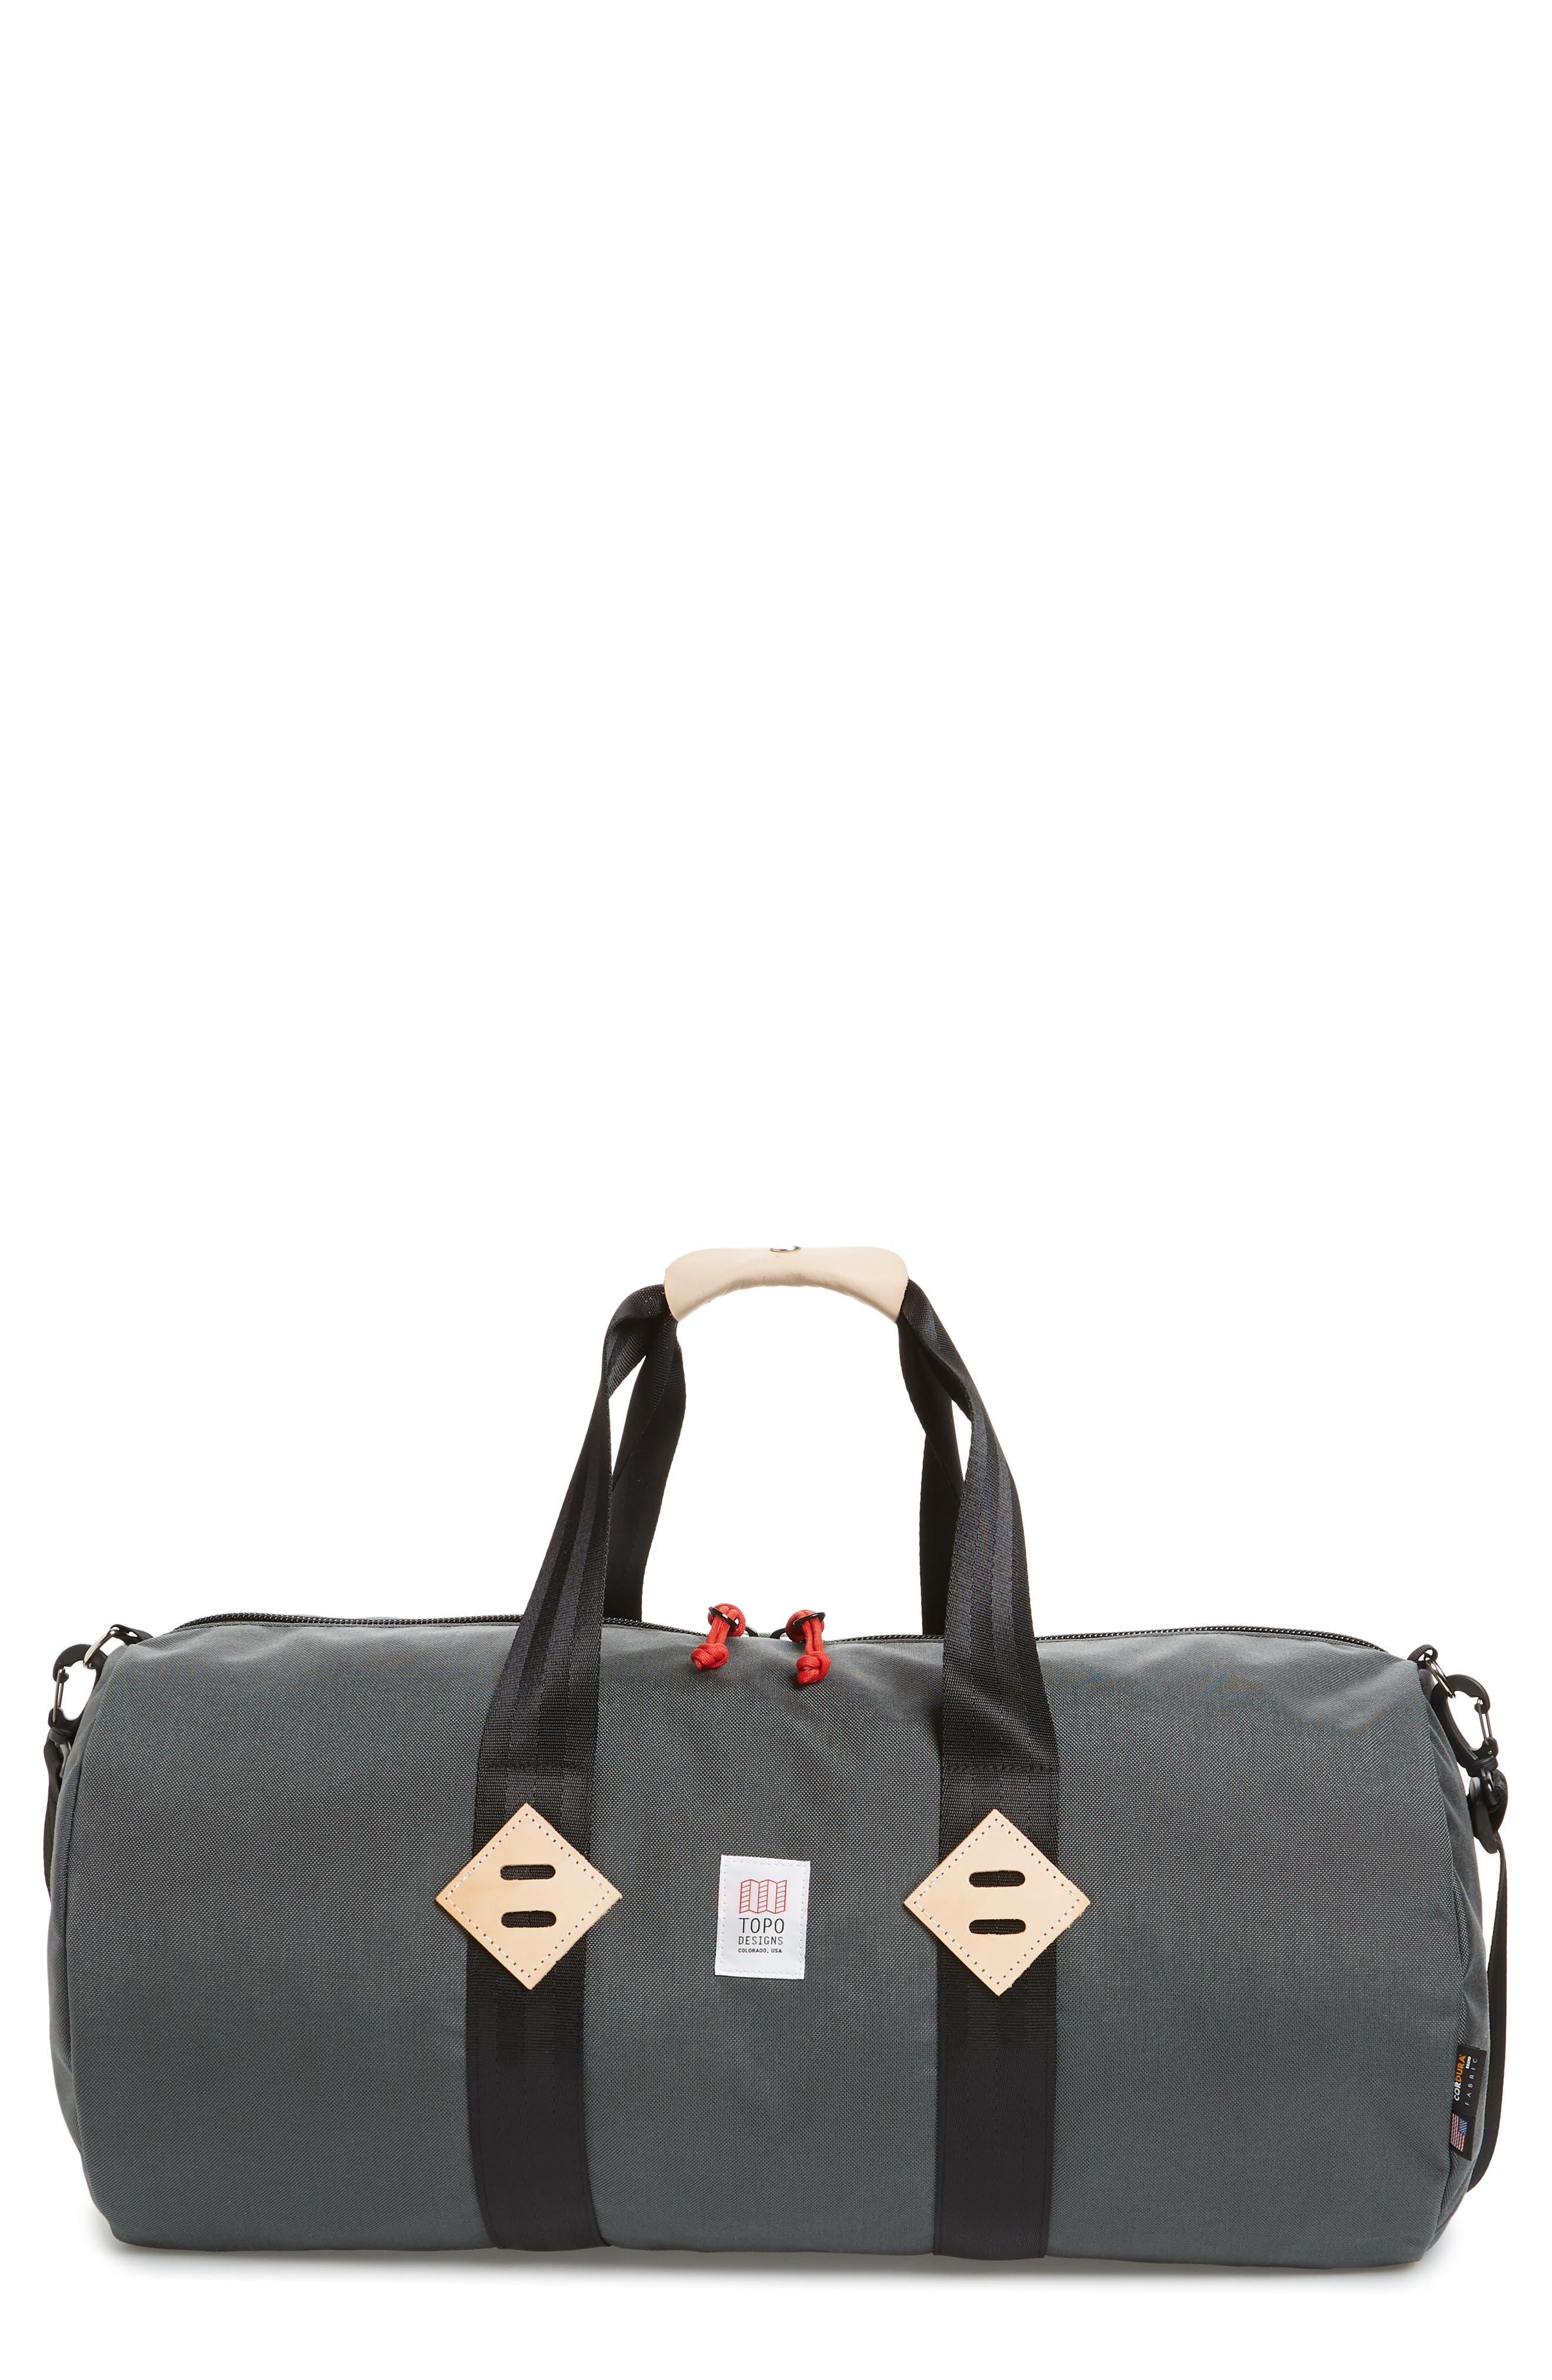 Classic Duffel Bag,                             Main thumbnail 1, color,                             CHARCOAL